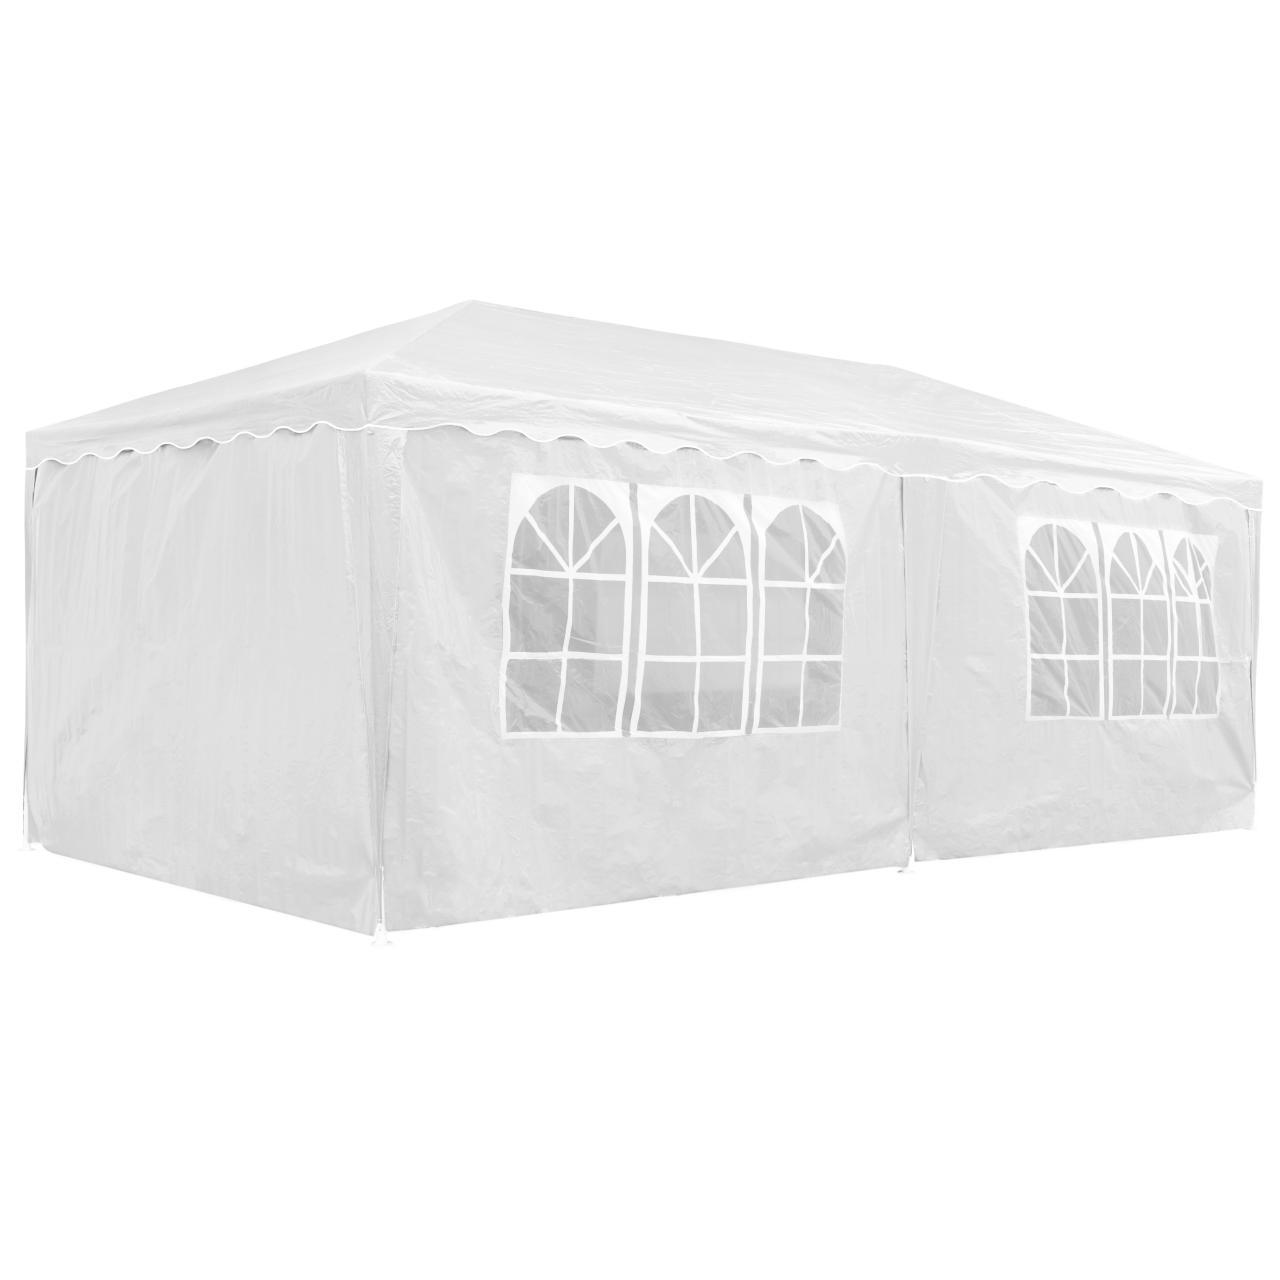 partyzelt festzelt 3x6m gartenpavillon gartenzelt bierzelt pavillon zelt ebay. Black Bedroom Furniture Sets. Home Design Ideas